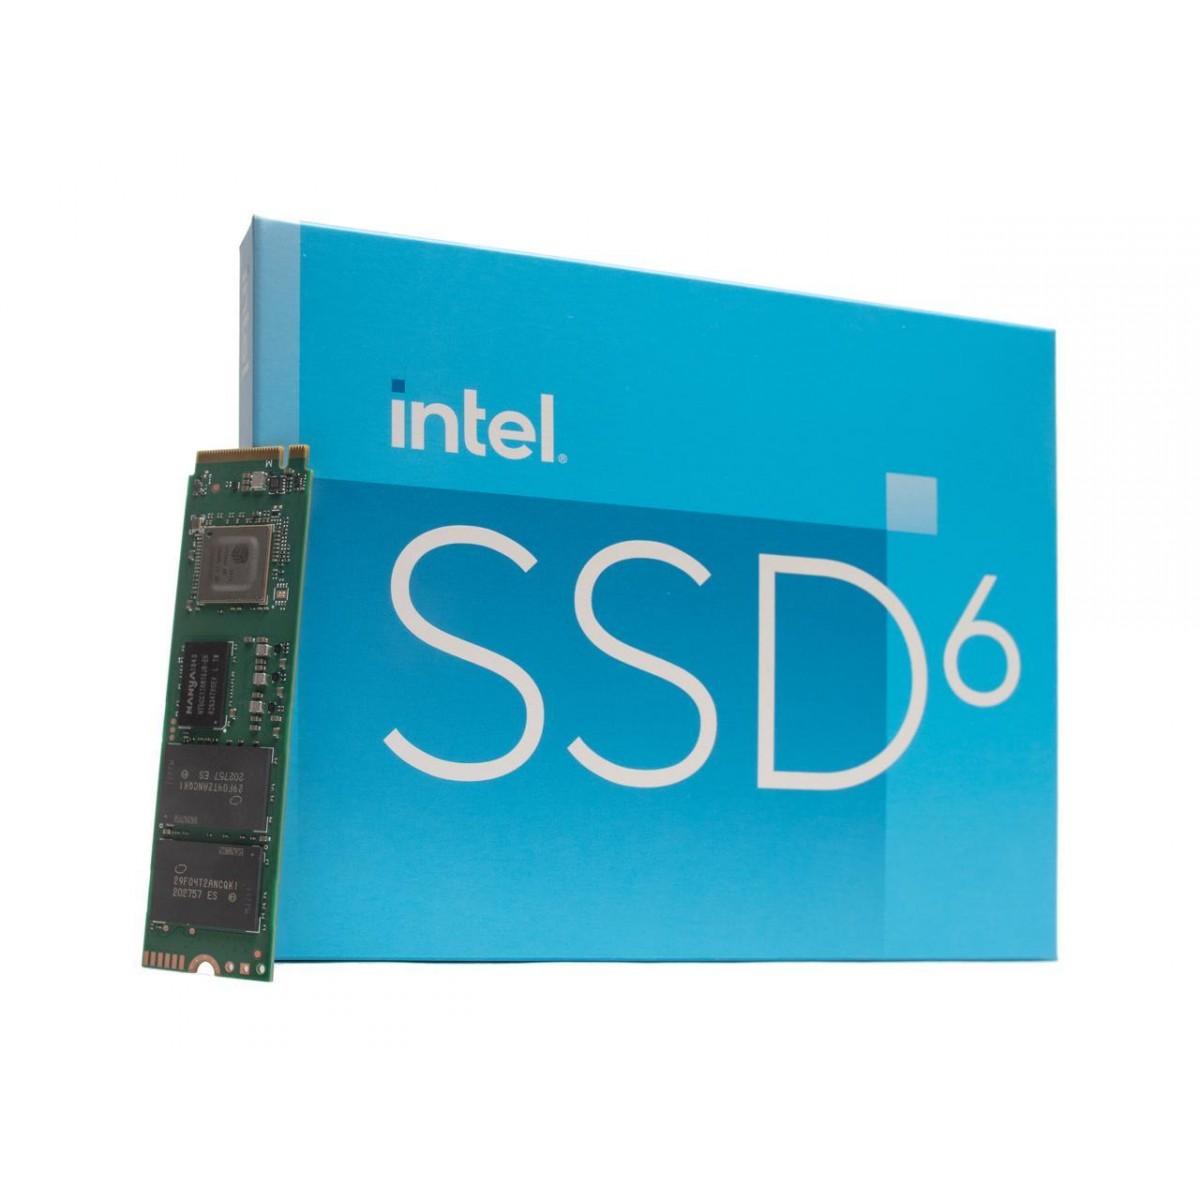 SSD Intel 670P, 1TB, M.2 NVMe, Leitura 3500MBs, Escrita 2500MBs, SSDPEKNU010TZX1